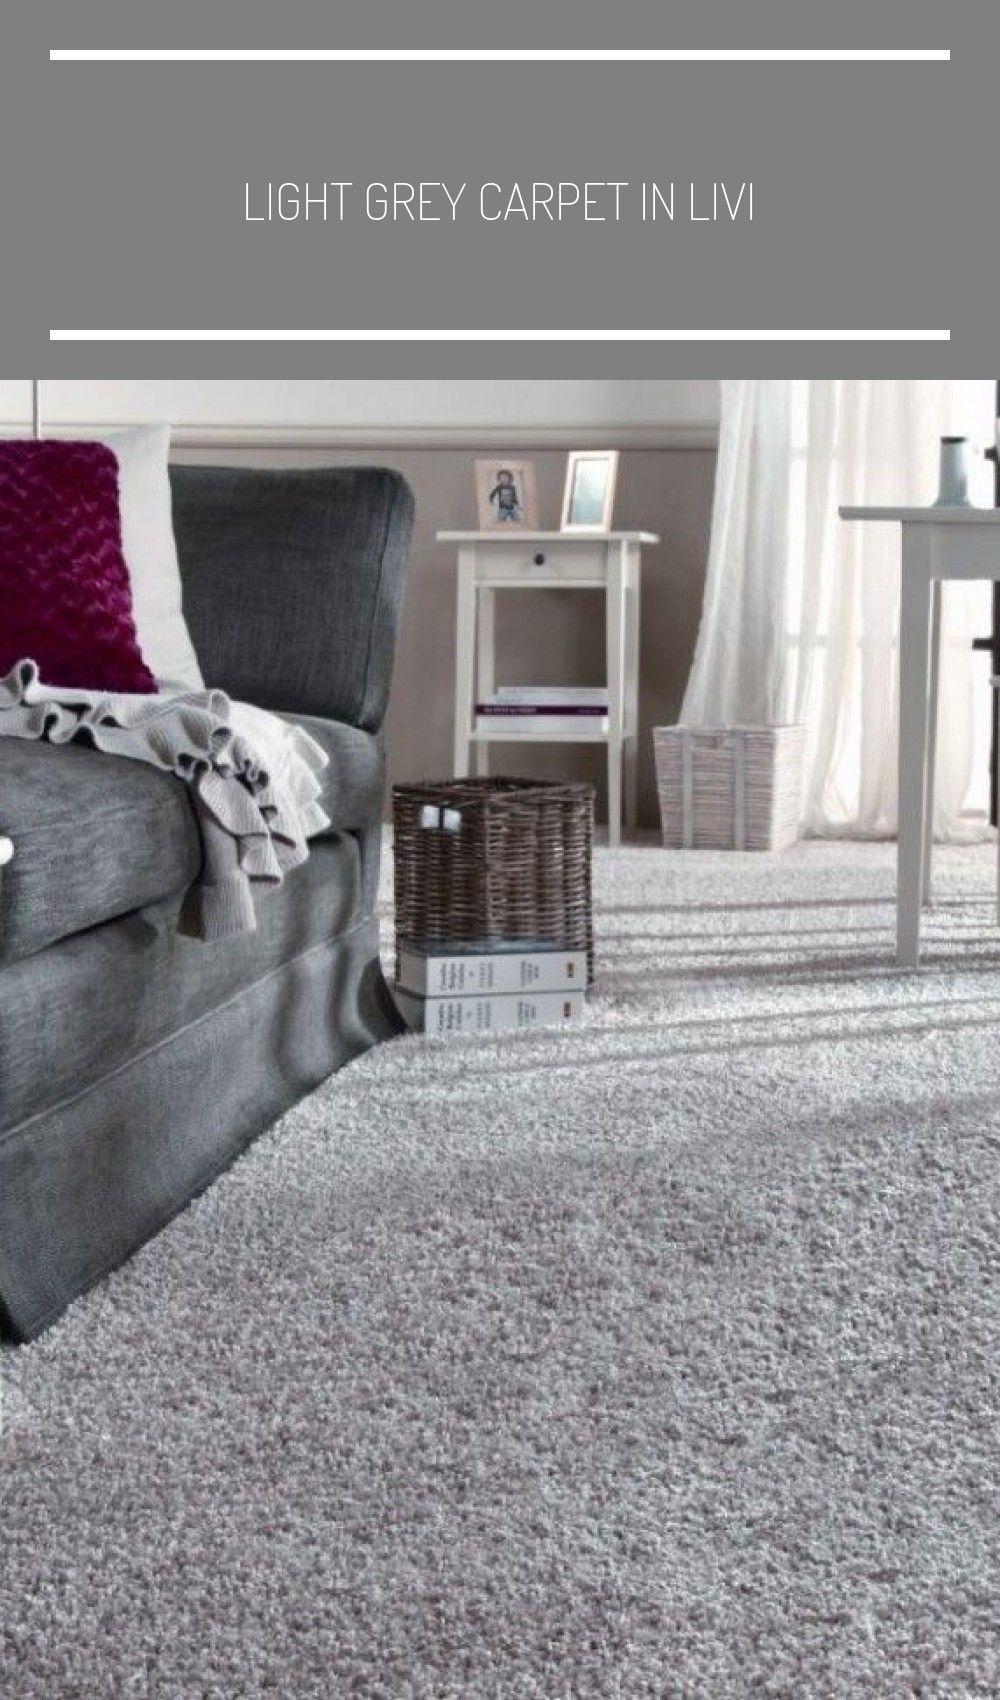 Light Grey Carpet In Living Room The Gray Violet Tones Of Lavender Carpeting Add Light Grey Carpet In Liv In 2020 Grey Carpet Grey Carpet Bedroom Light Gray Carpet